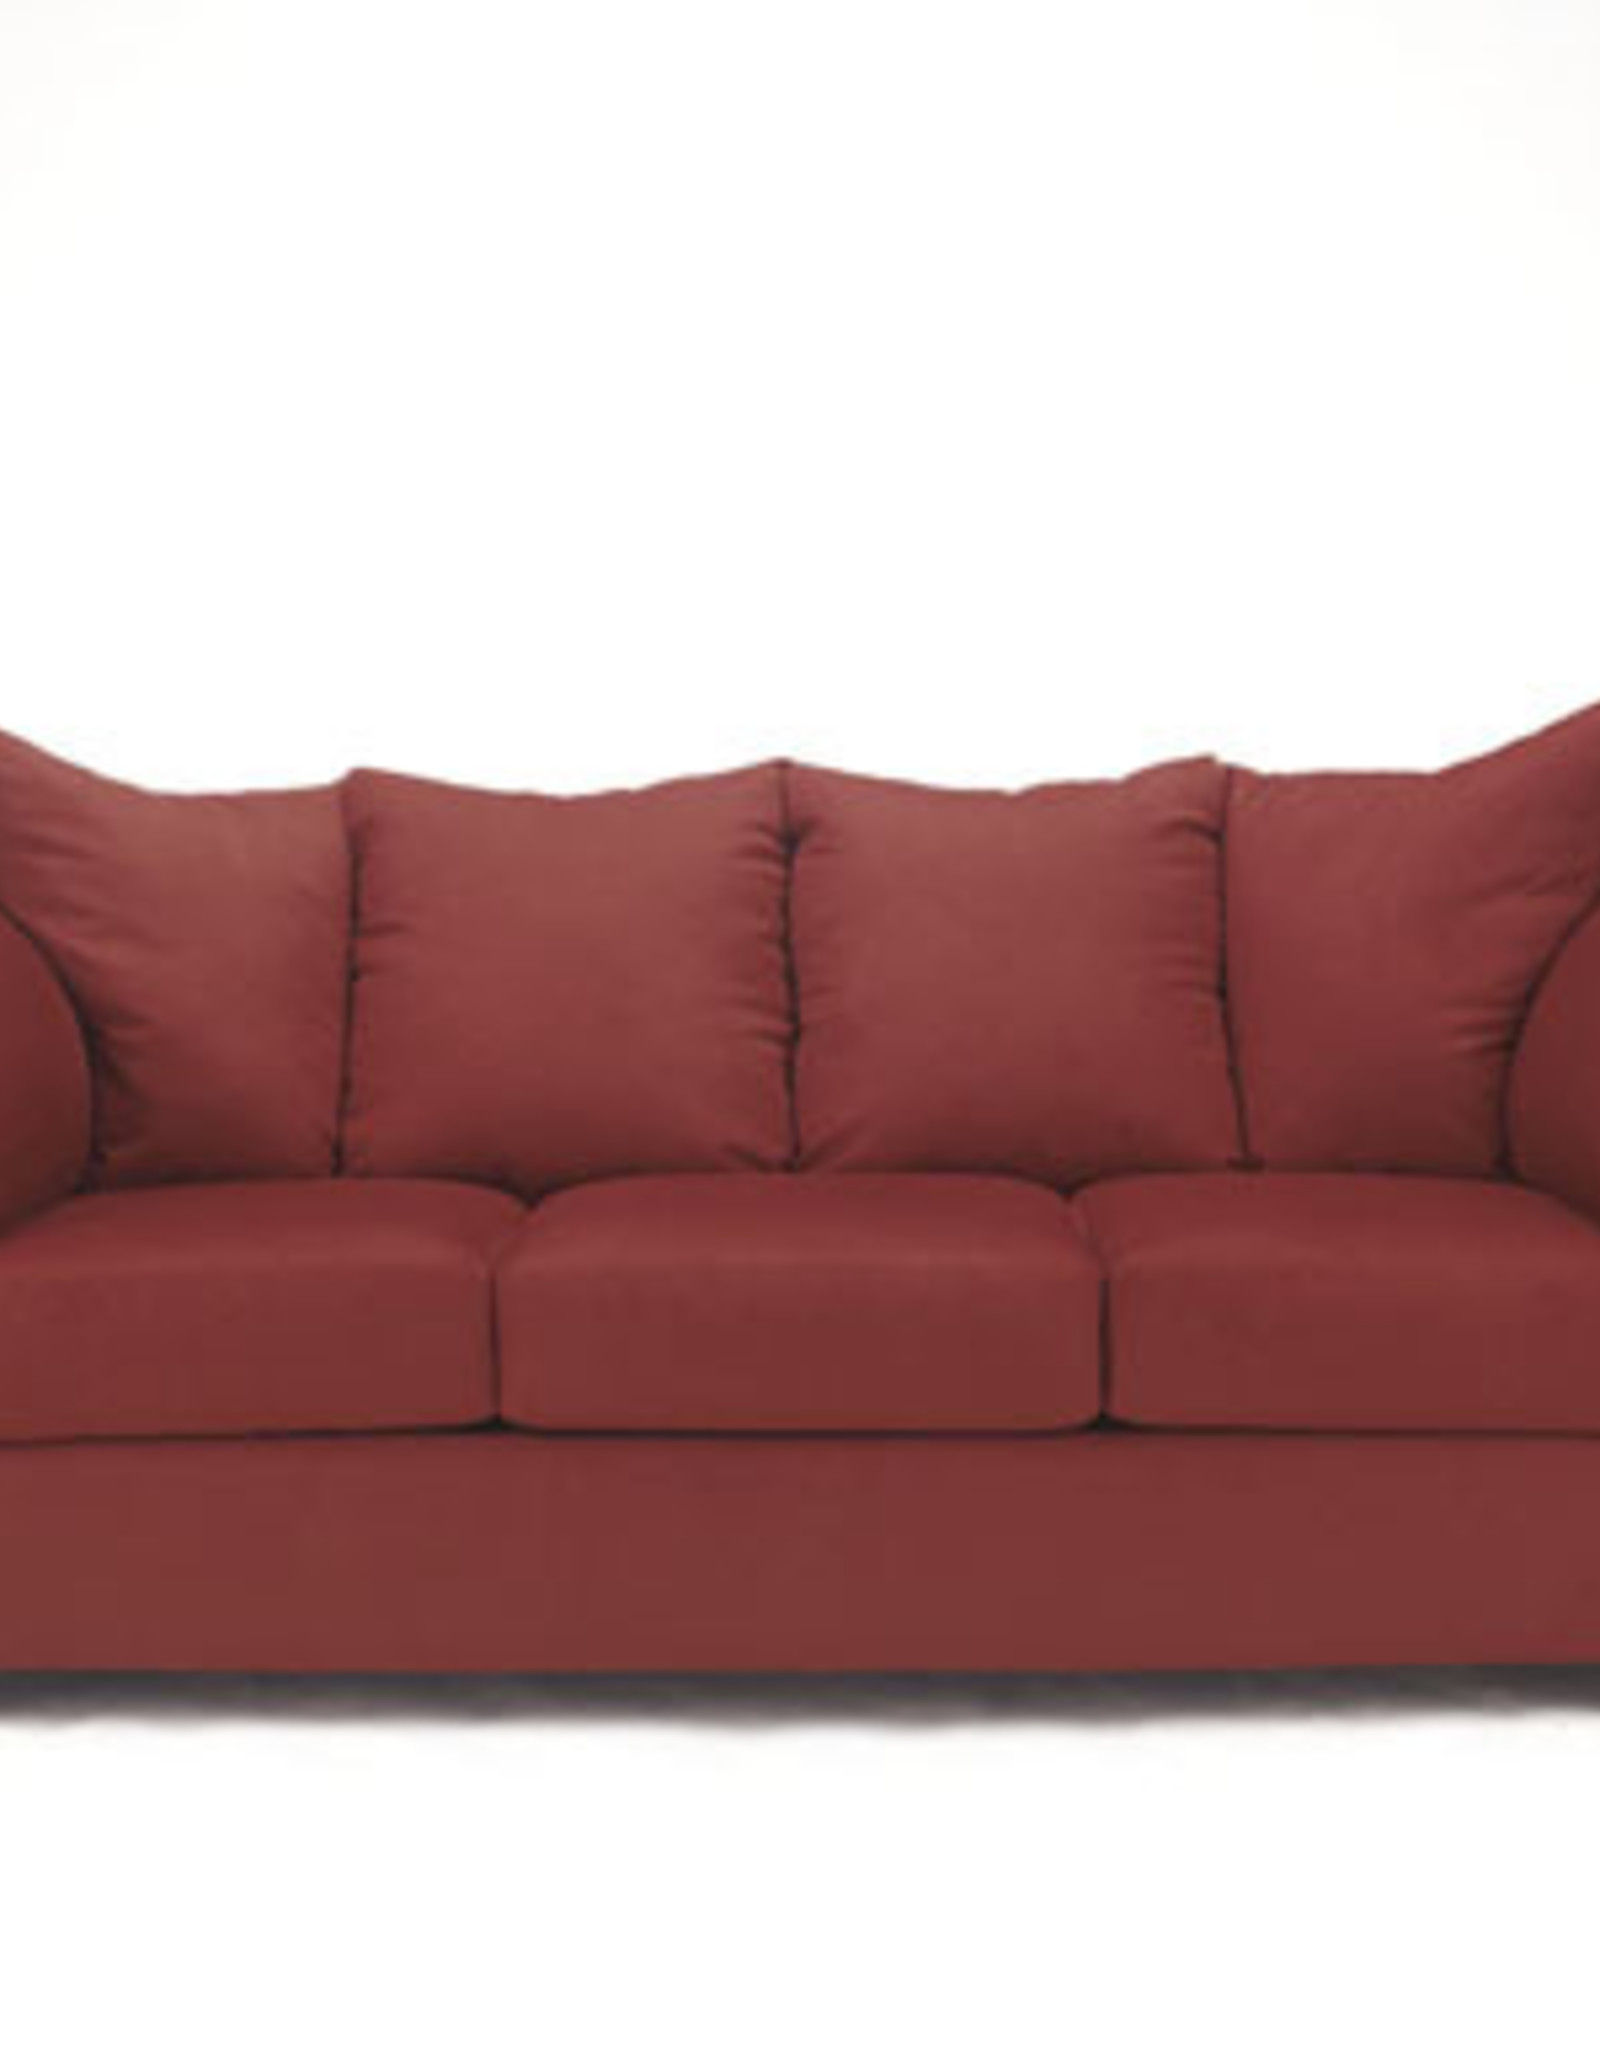 Darcy Sofa (Salsa) Displayed in Showroom in Black